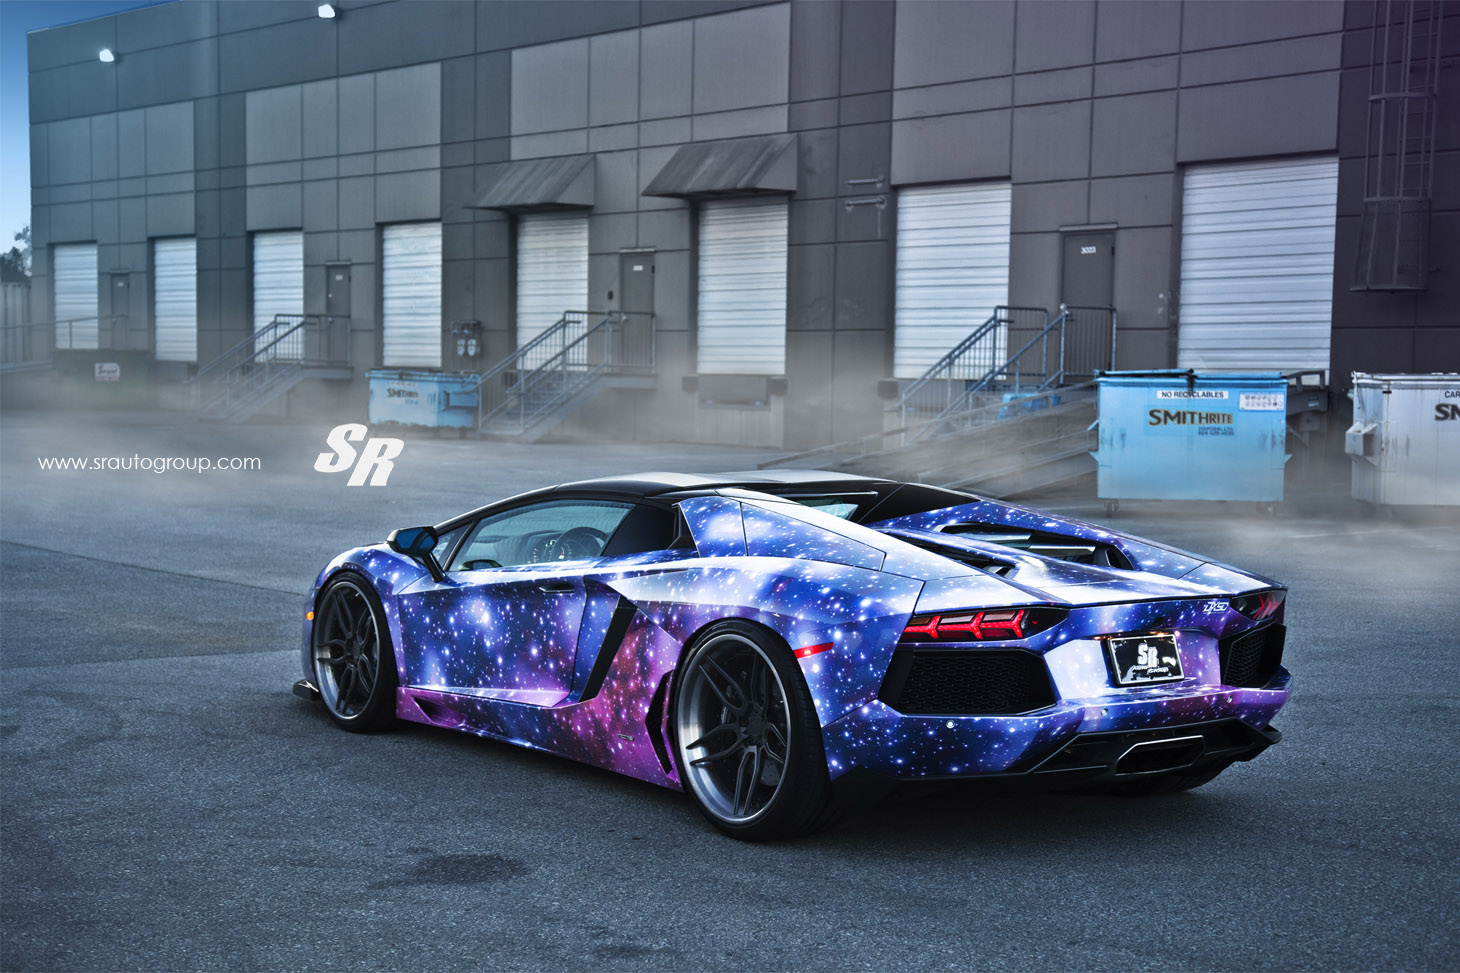 SR Auto